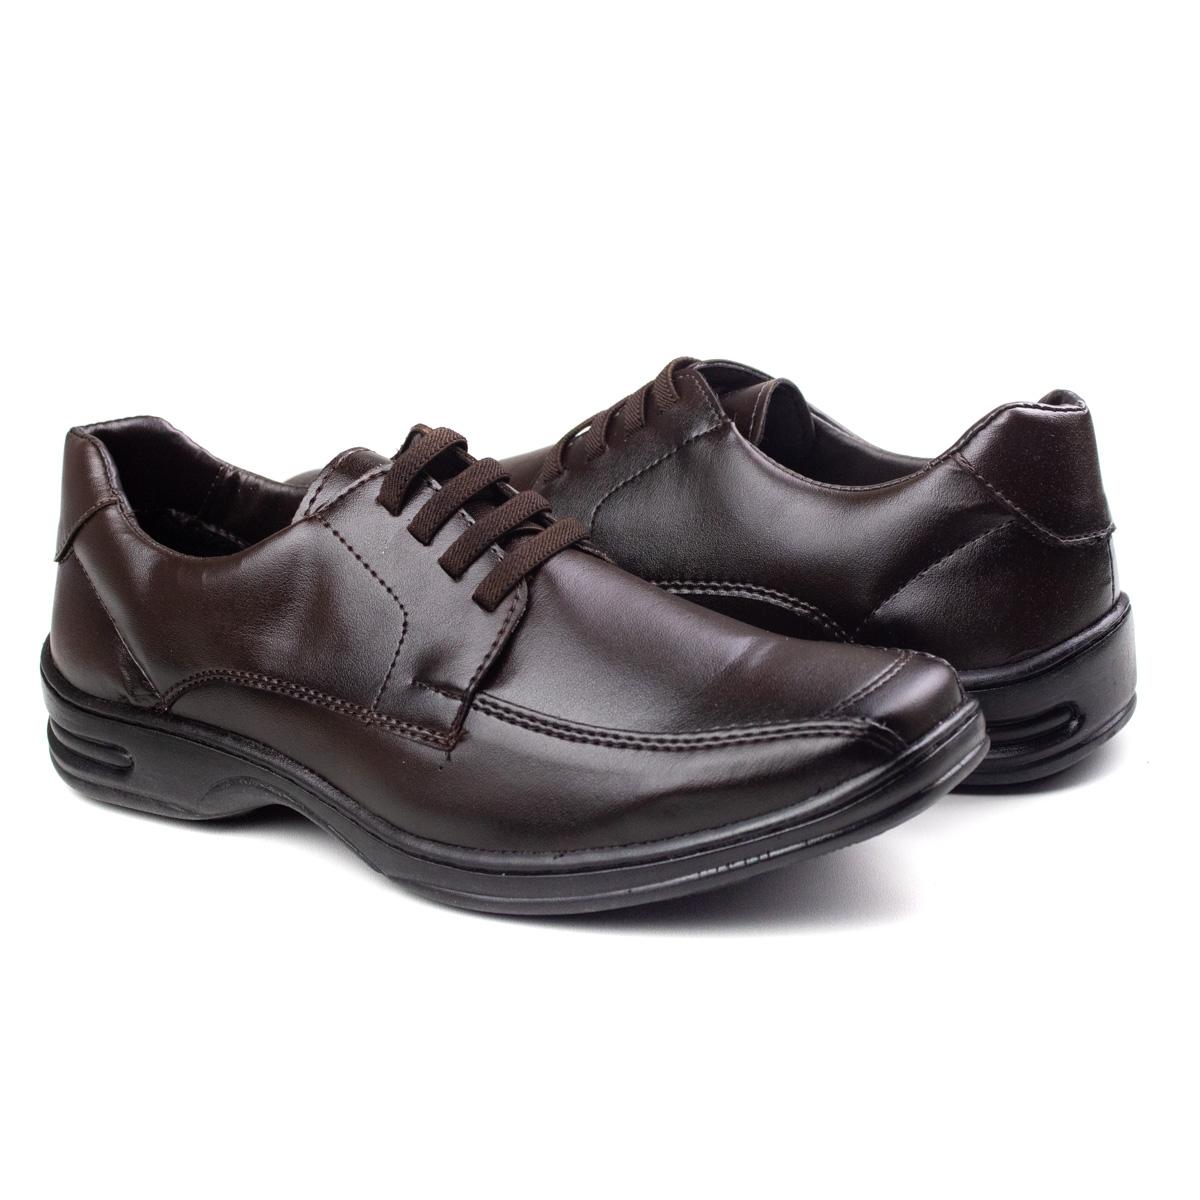 Sapato Amarrar Masculino Franshoes - Cafe